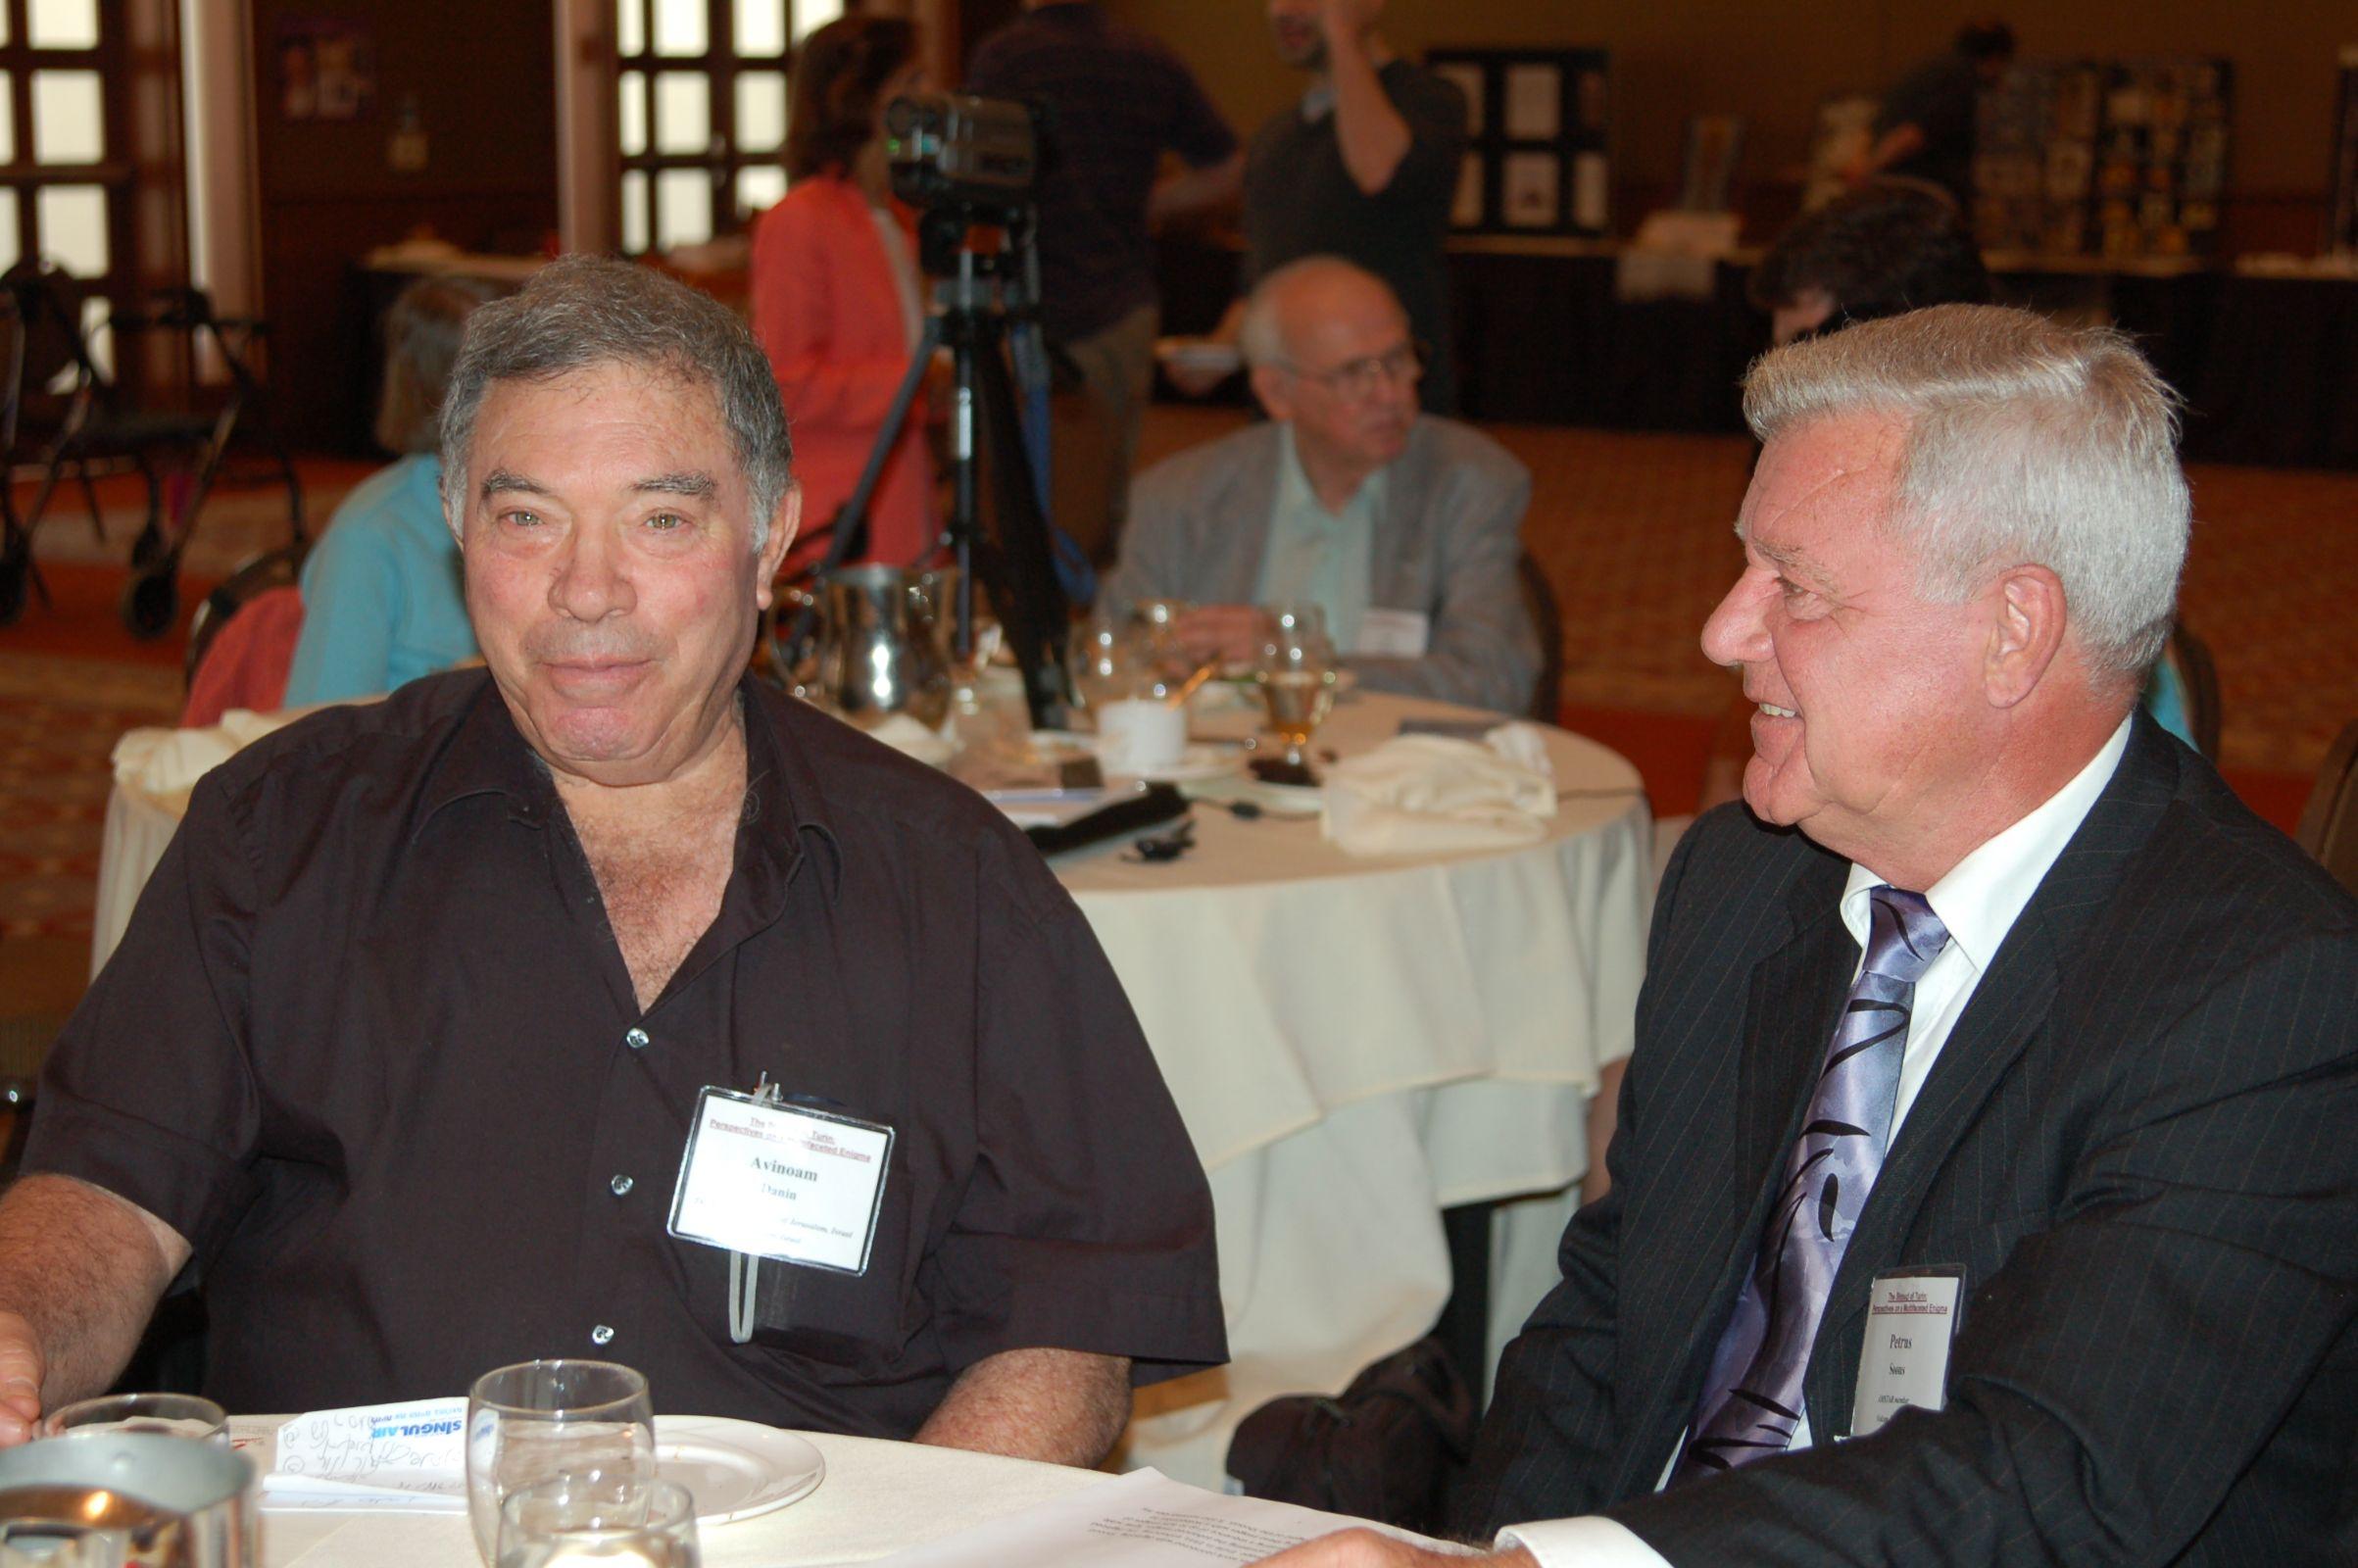 Photo 8. Avinoam Danin and Dr. Soons in Ohio